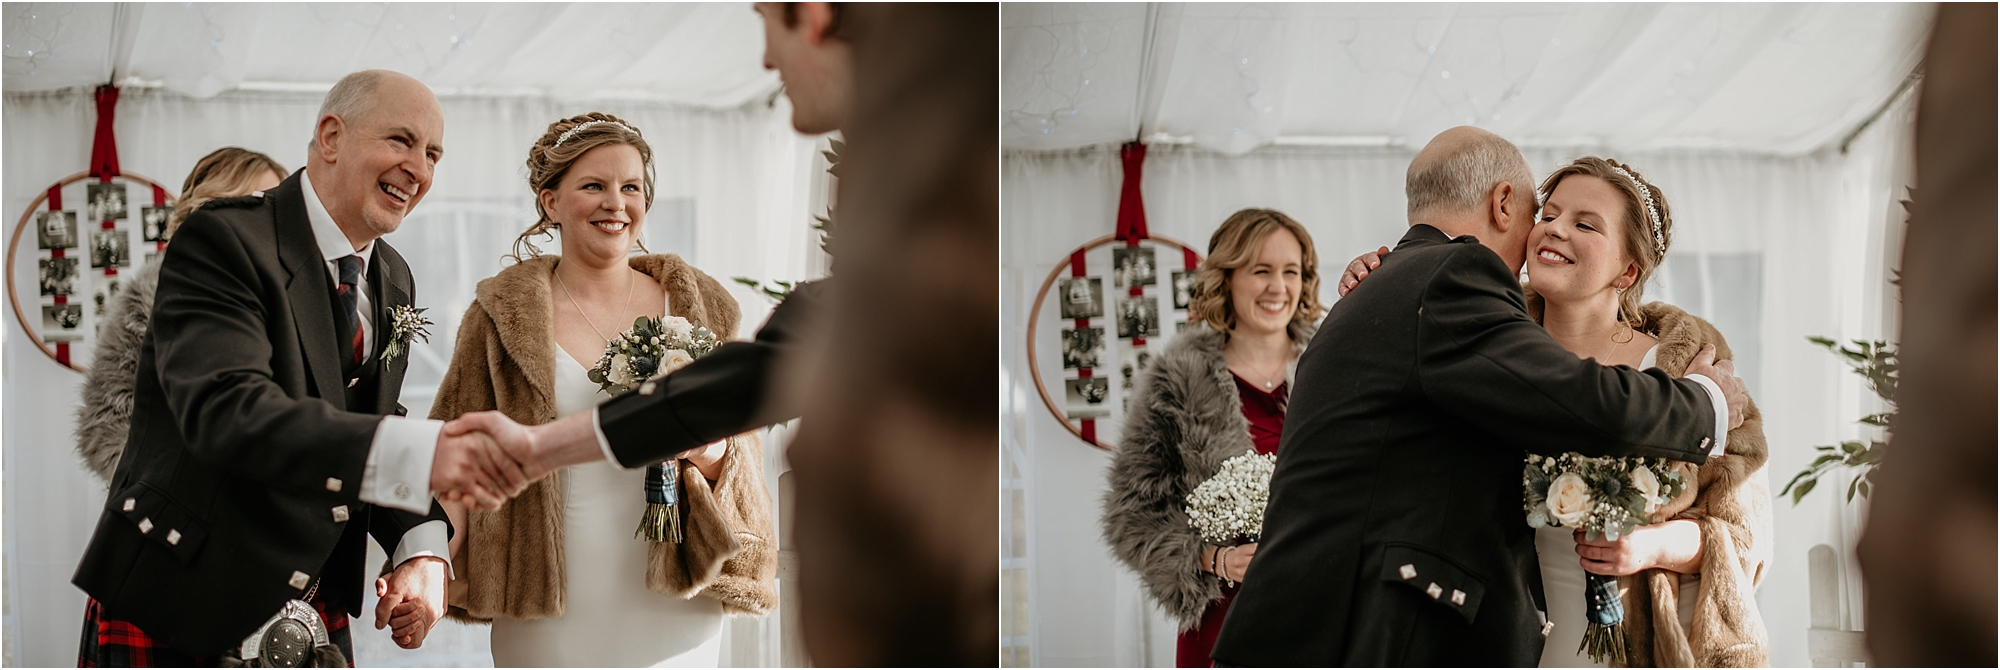 Kinlochard-village-hall-scottish-wedding-claire-fleck-photography__0024.jpg